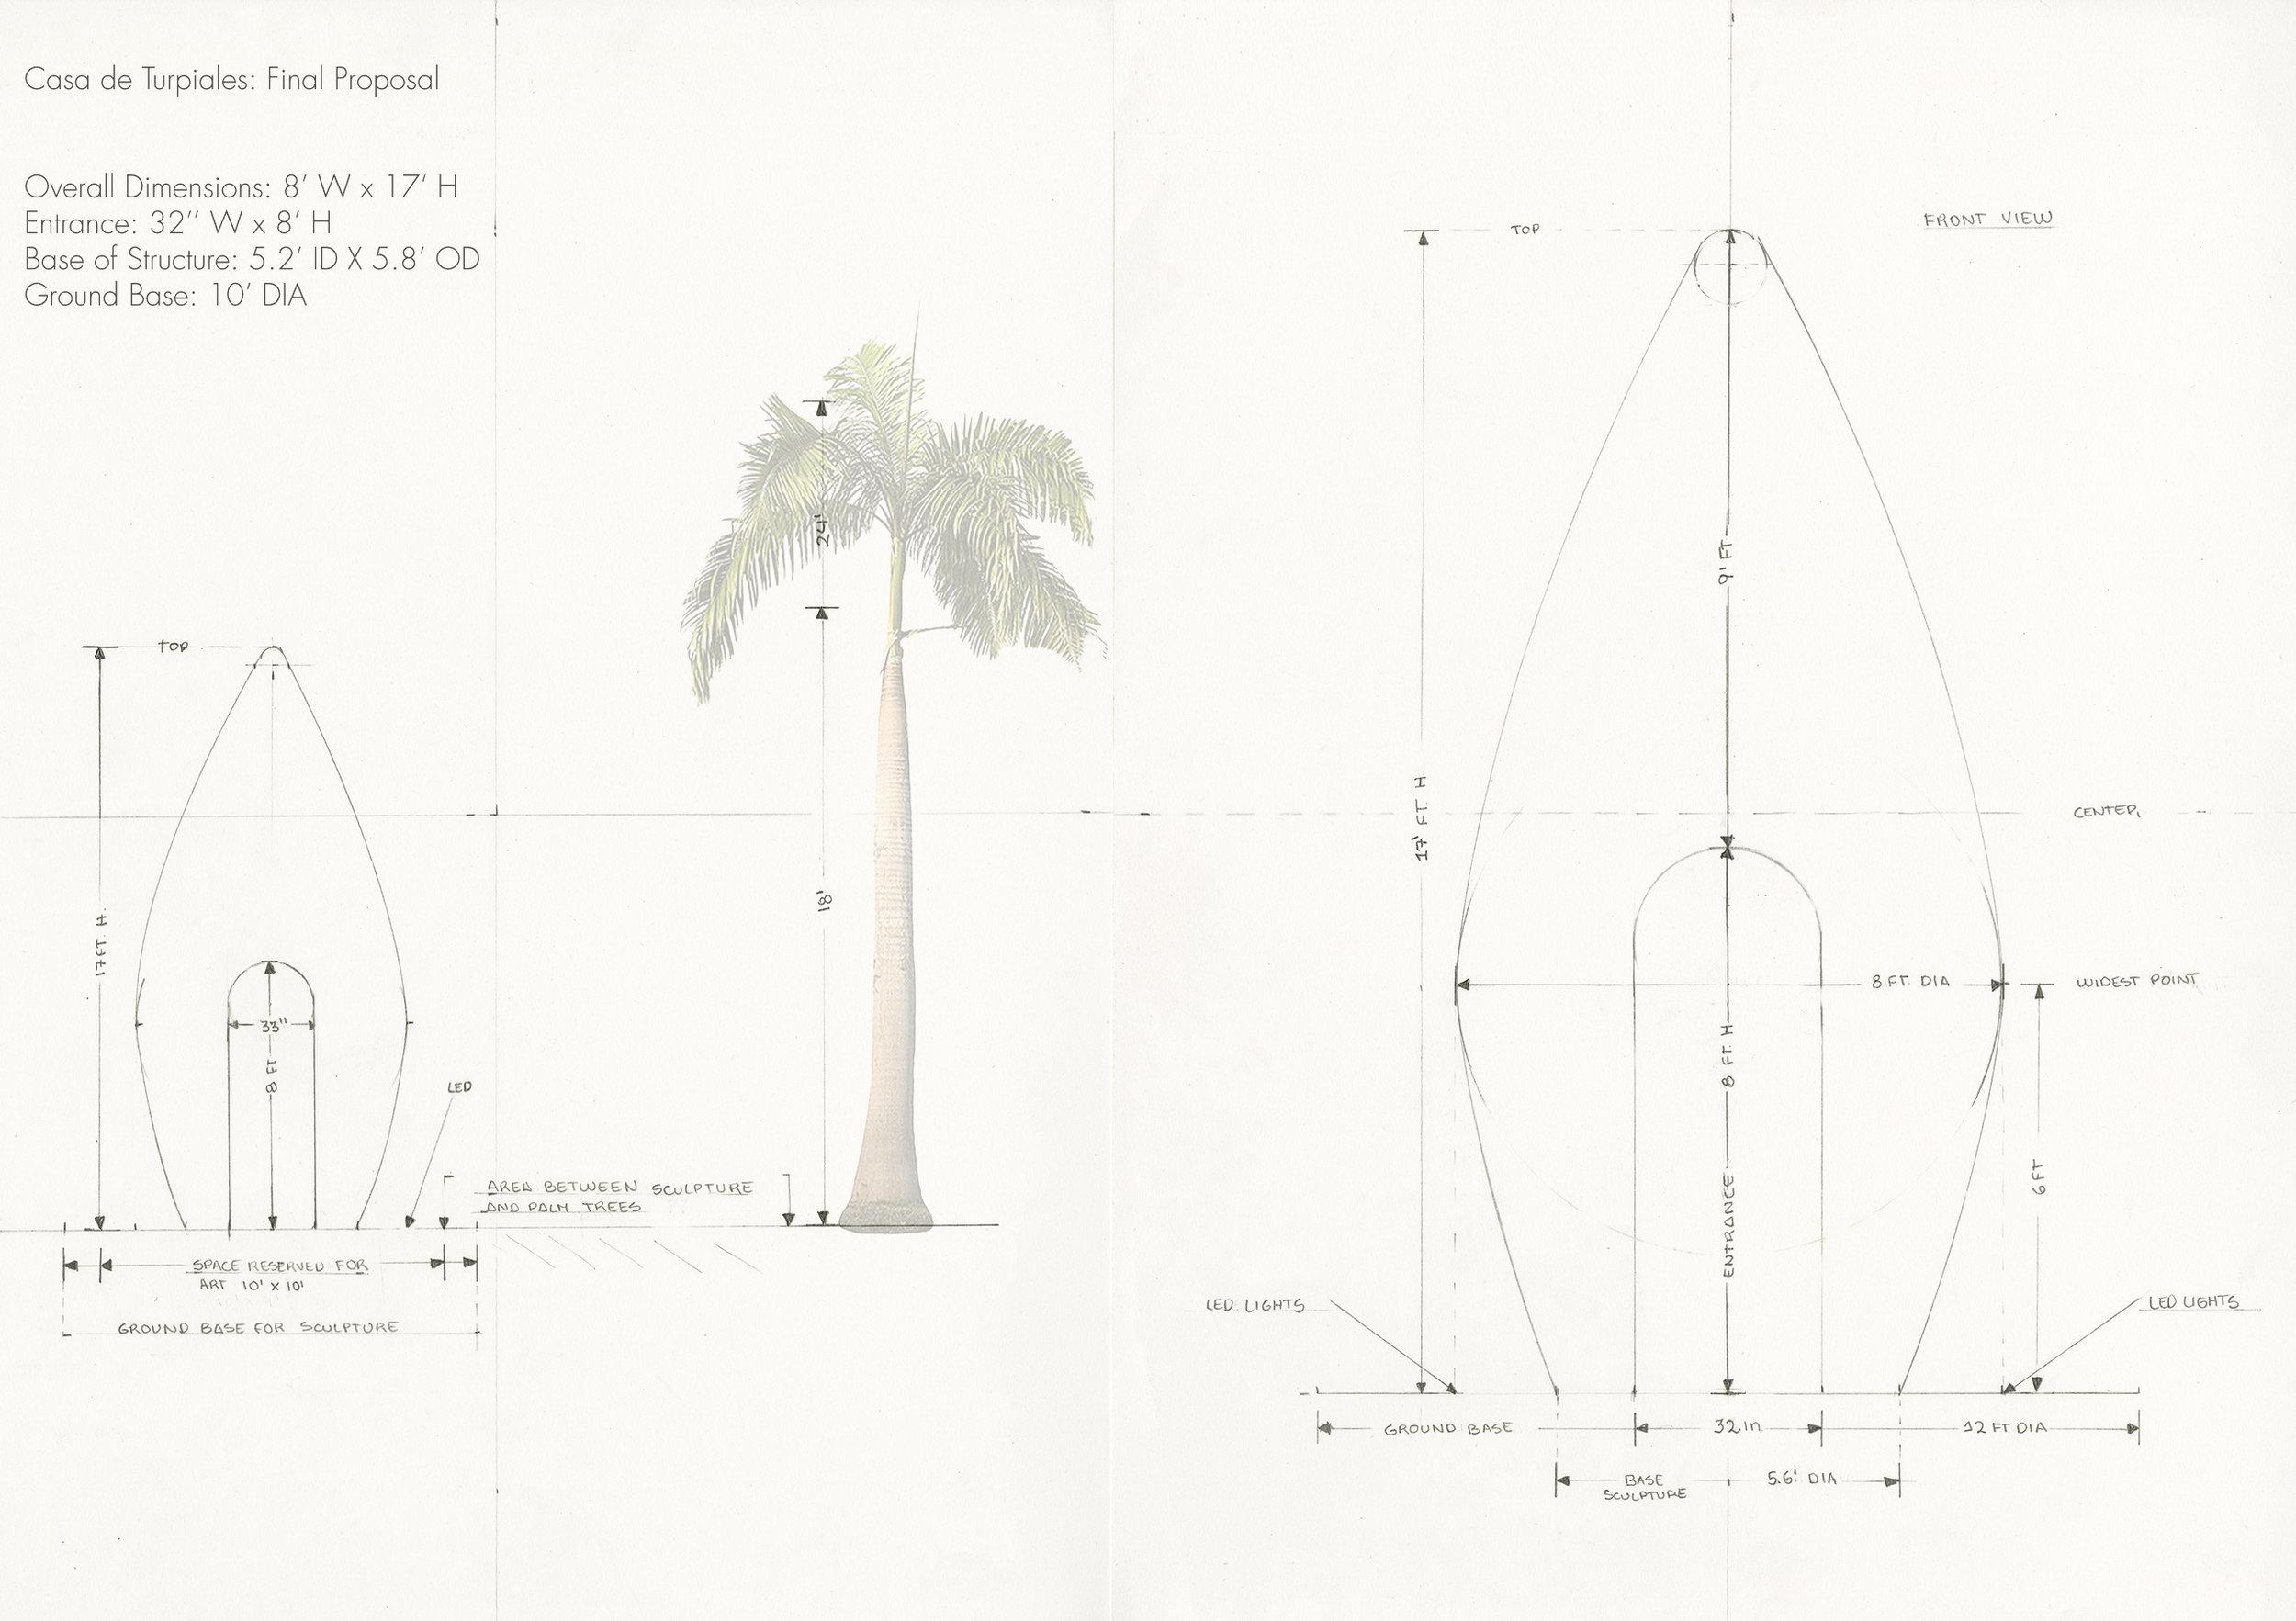 art-measurements.jpg